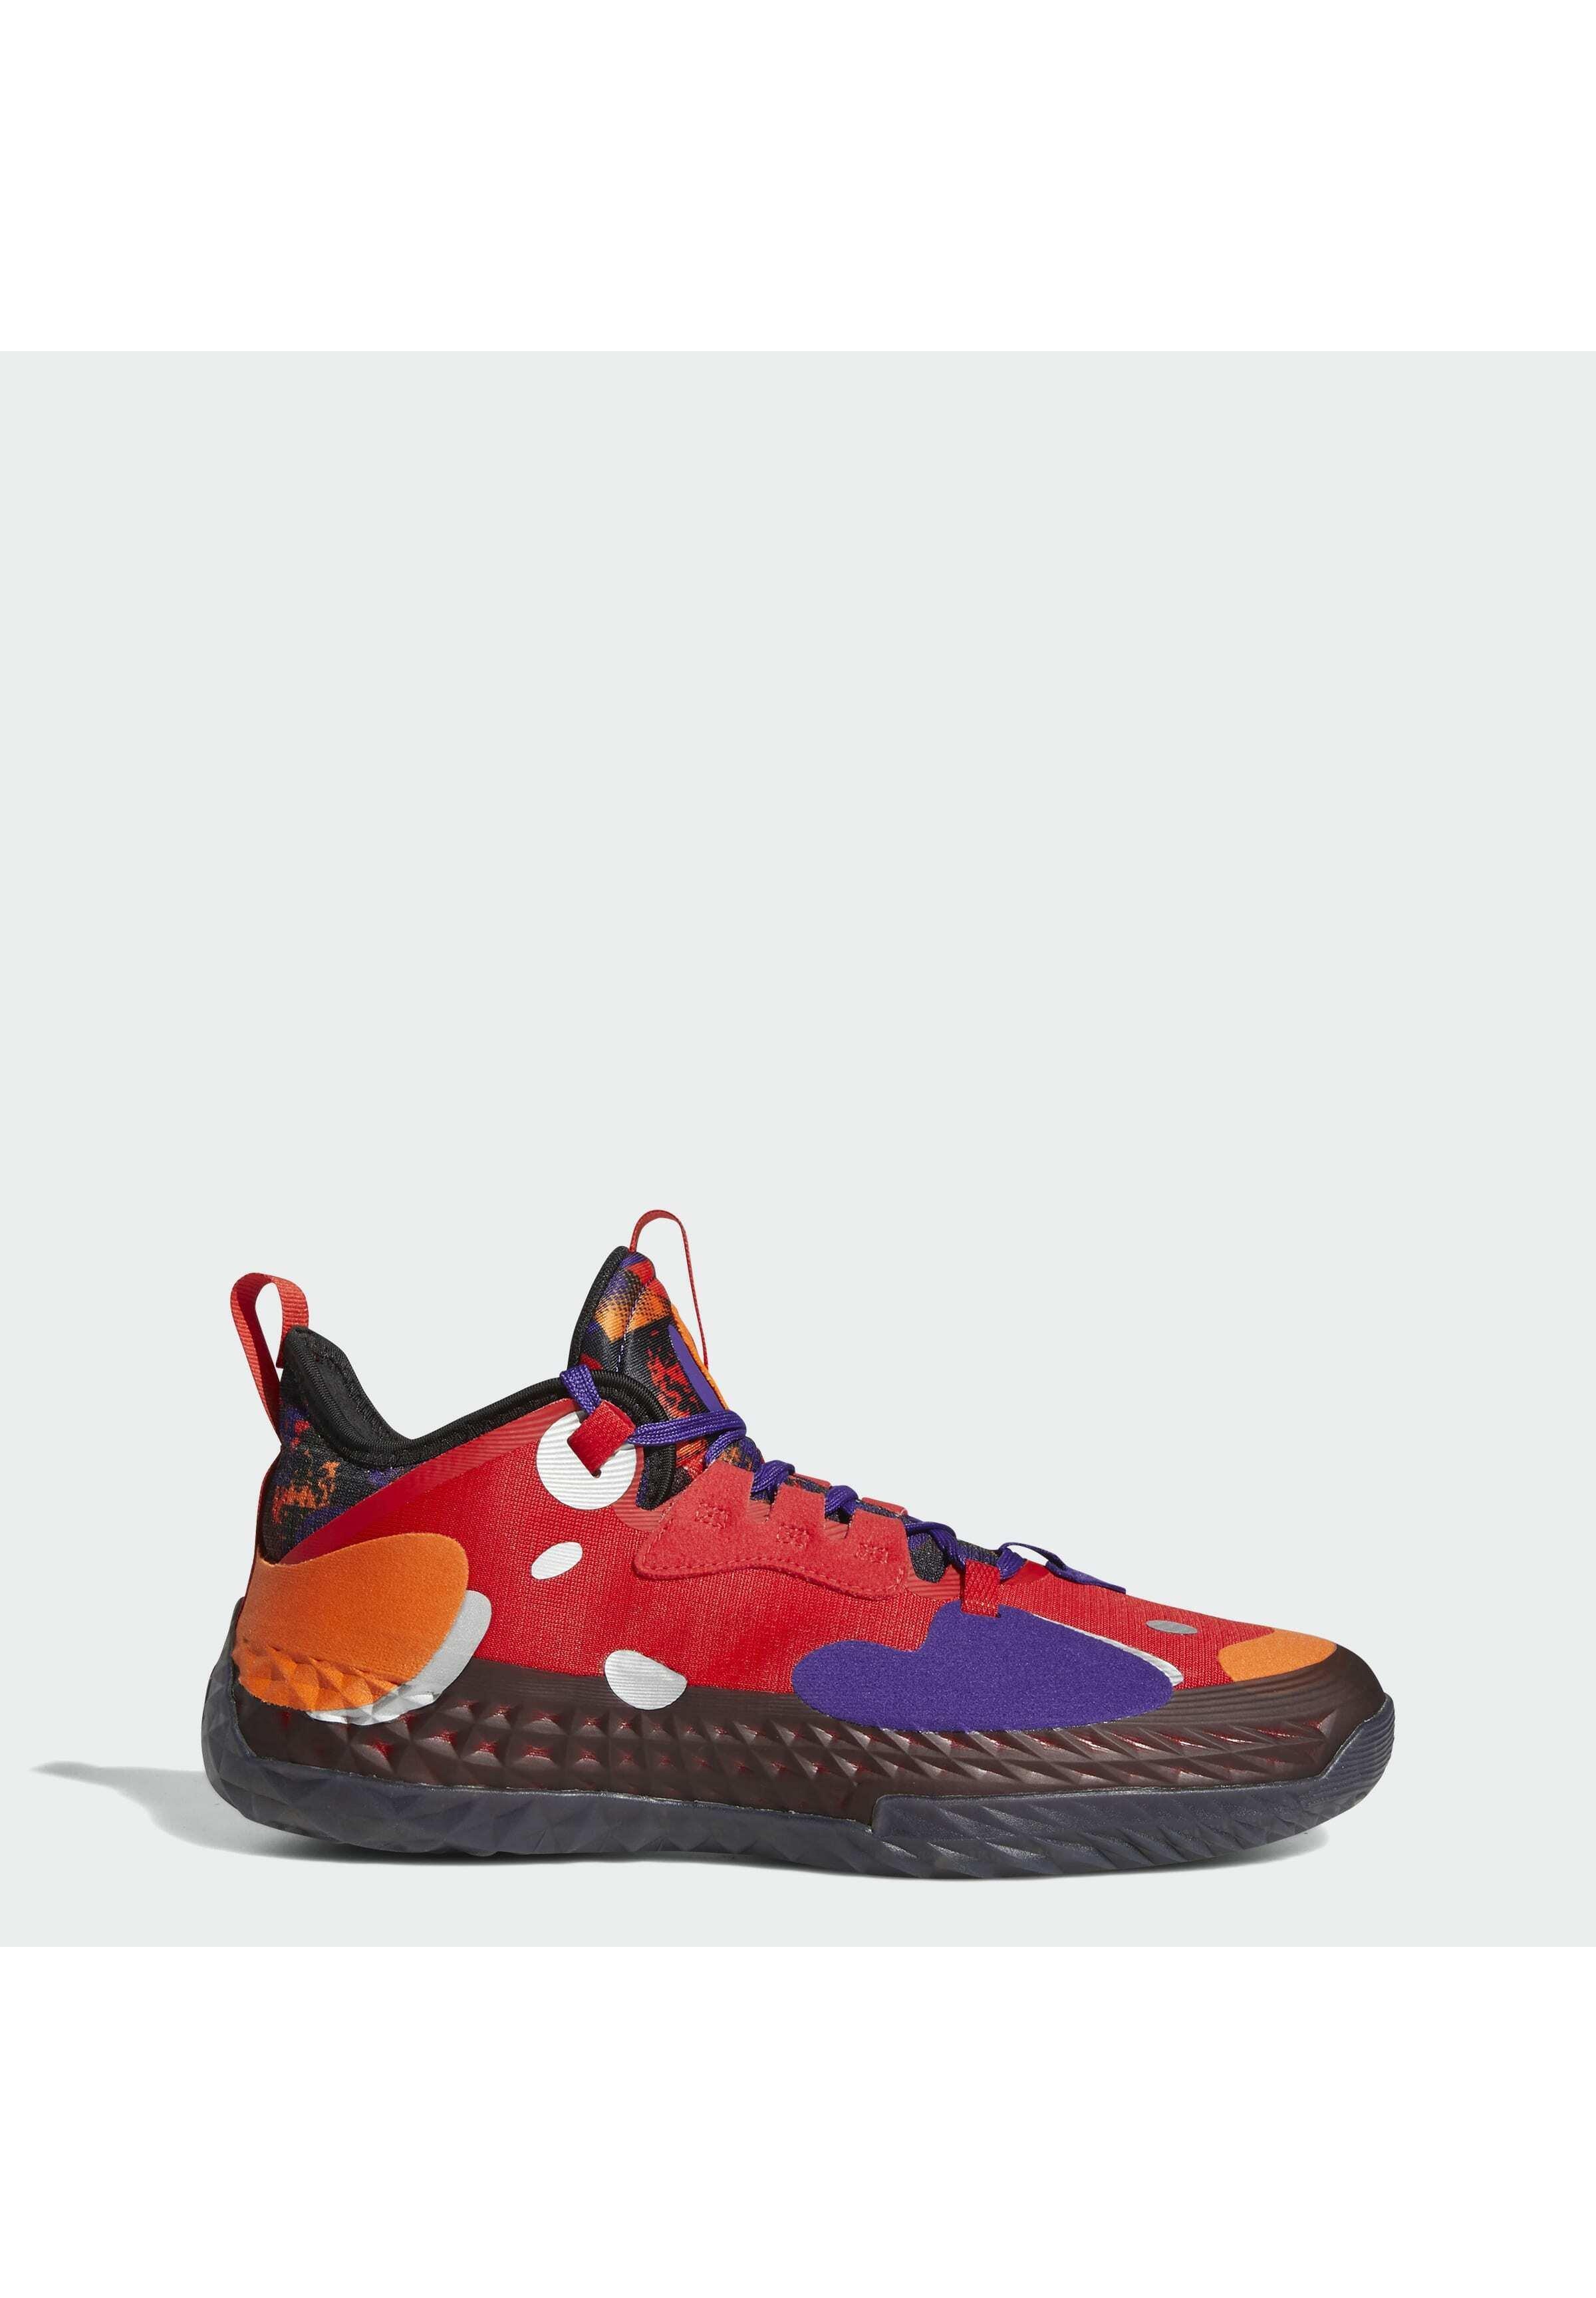 Women Harden Vol. 5 Futurenatural BOOST LGHTSTRKE BASKETBALL SNEAKERS SHOES - Basketball shoes